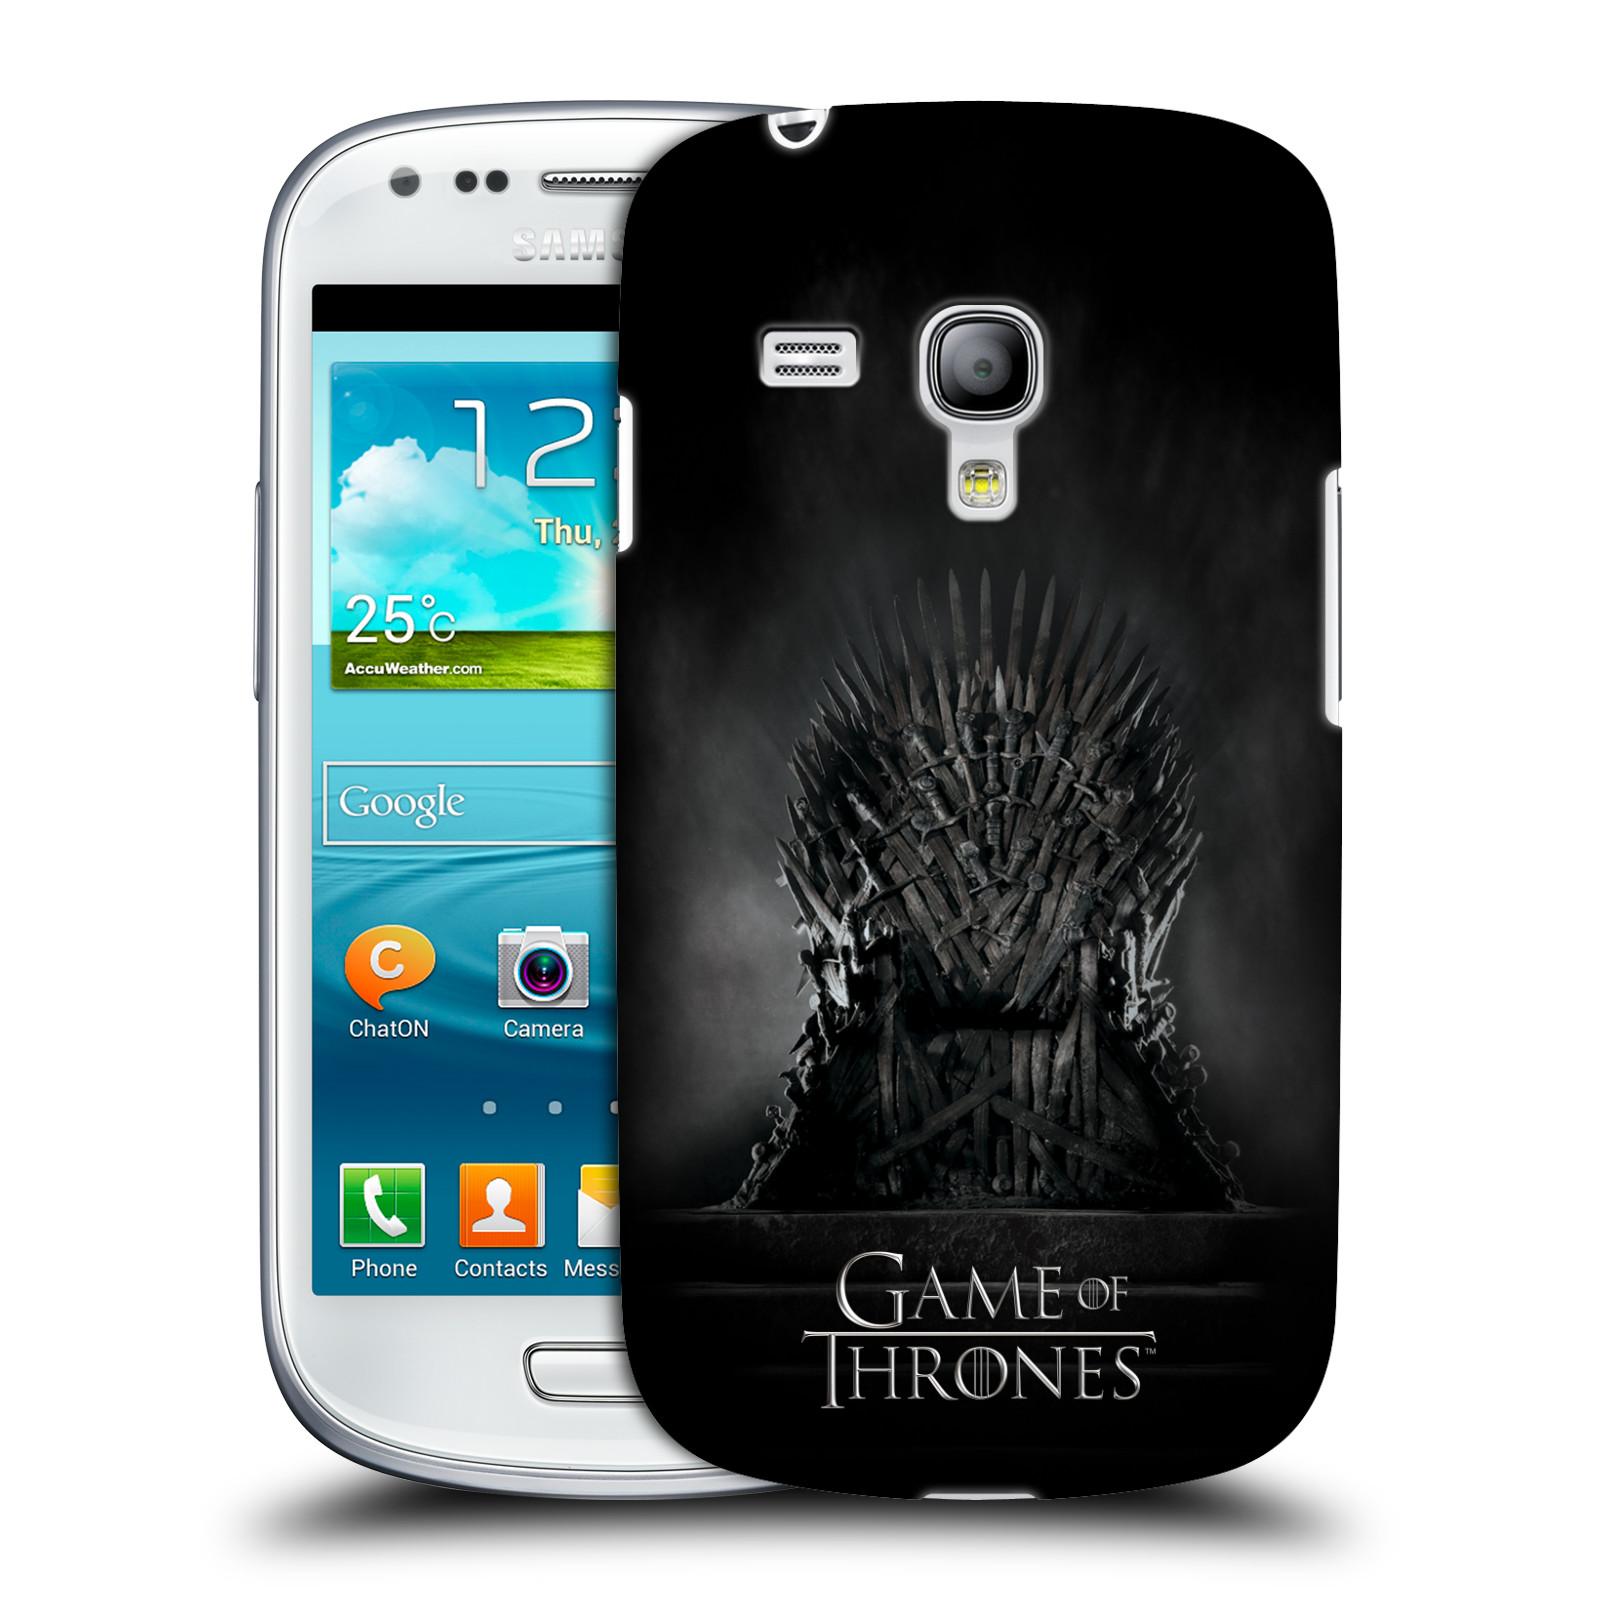 Plastové pouzdro na mobil Samsung Galaxy S III Mini VE HEAD CASE Hra o trůny - Železný trůn (Kryt či obal na mobilní telefon s licencovaným motivem Hra o trůny / Game Of Thrones pro Samsung Galaxy S3 Mini VE GT-i8200)